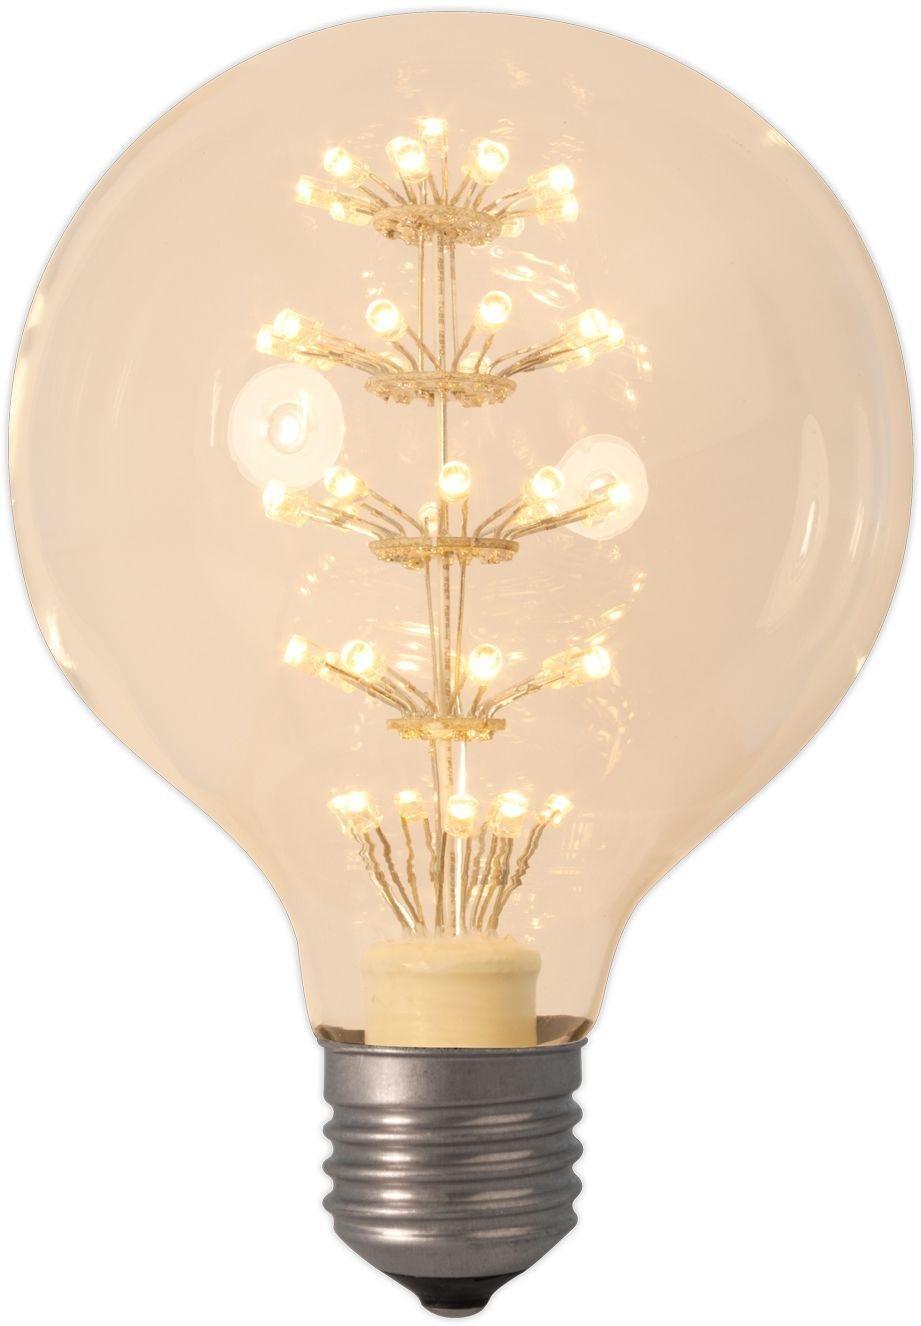 Image of Calex Decorative Pearl LED 95mm Large Globe Warm White Bulb.